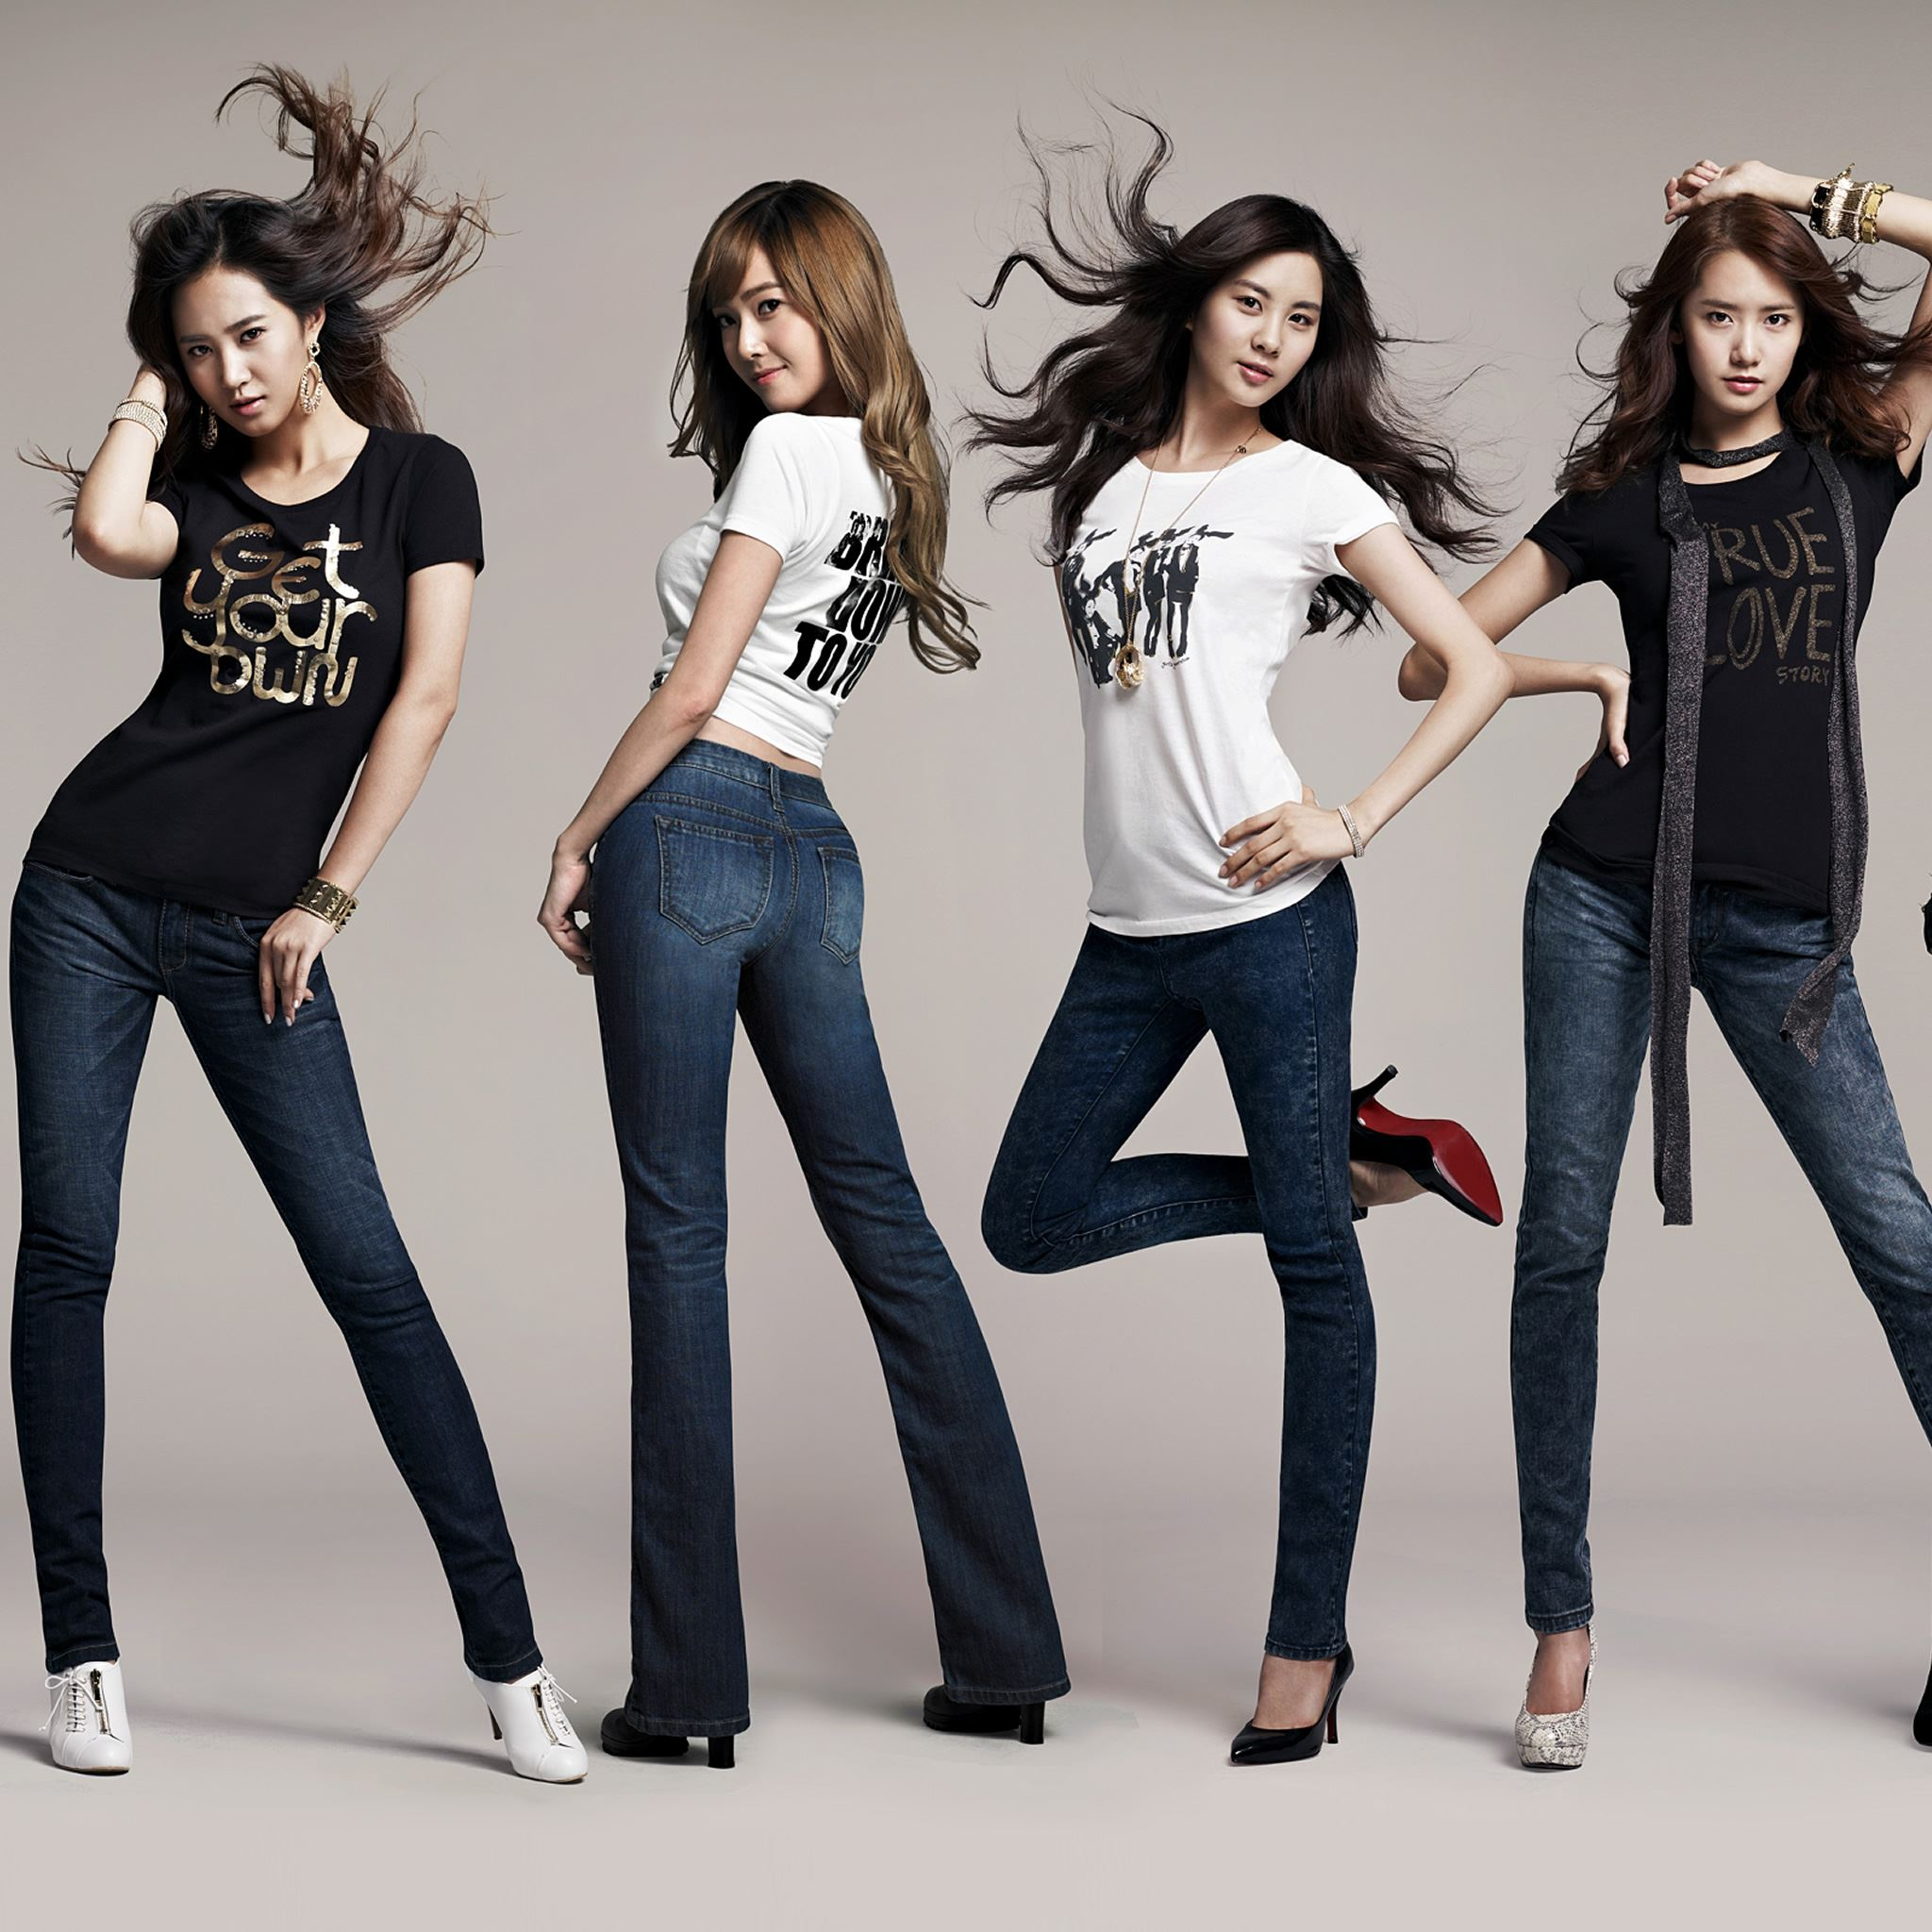 Фото про 4 девушек